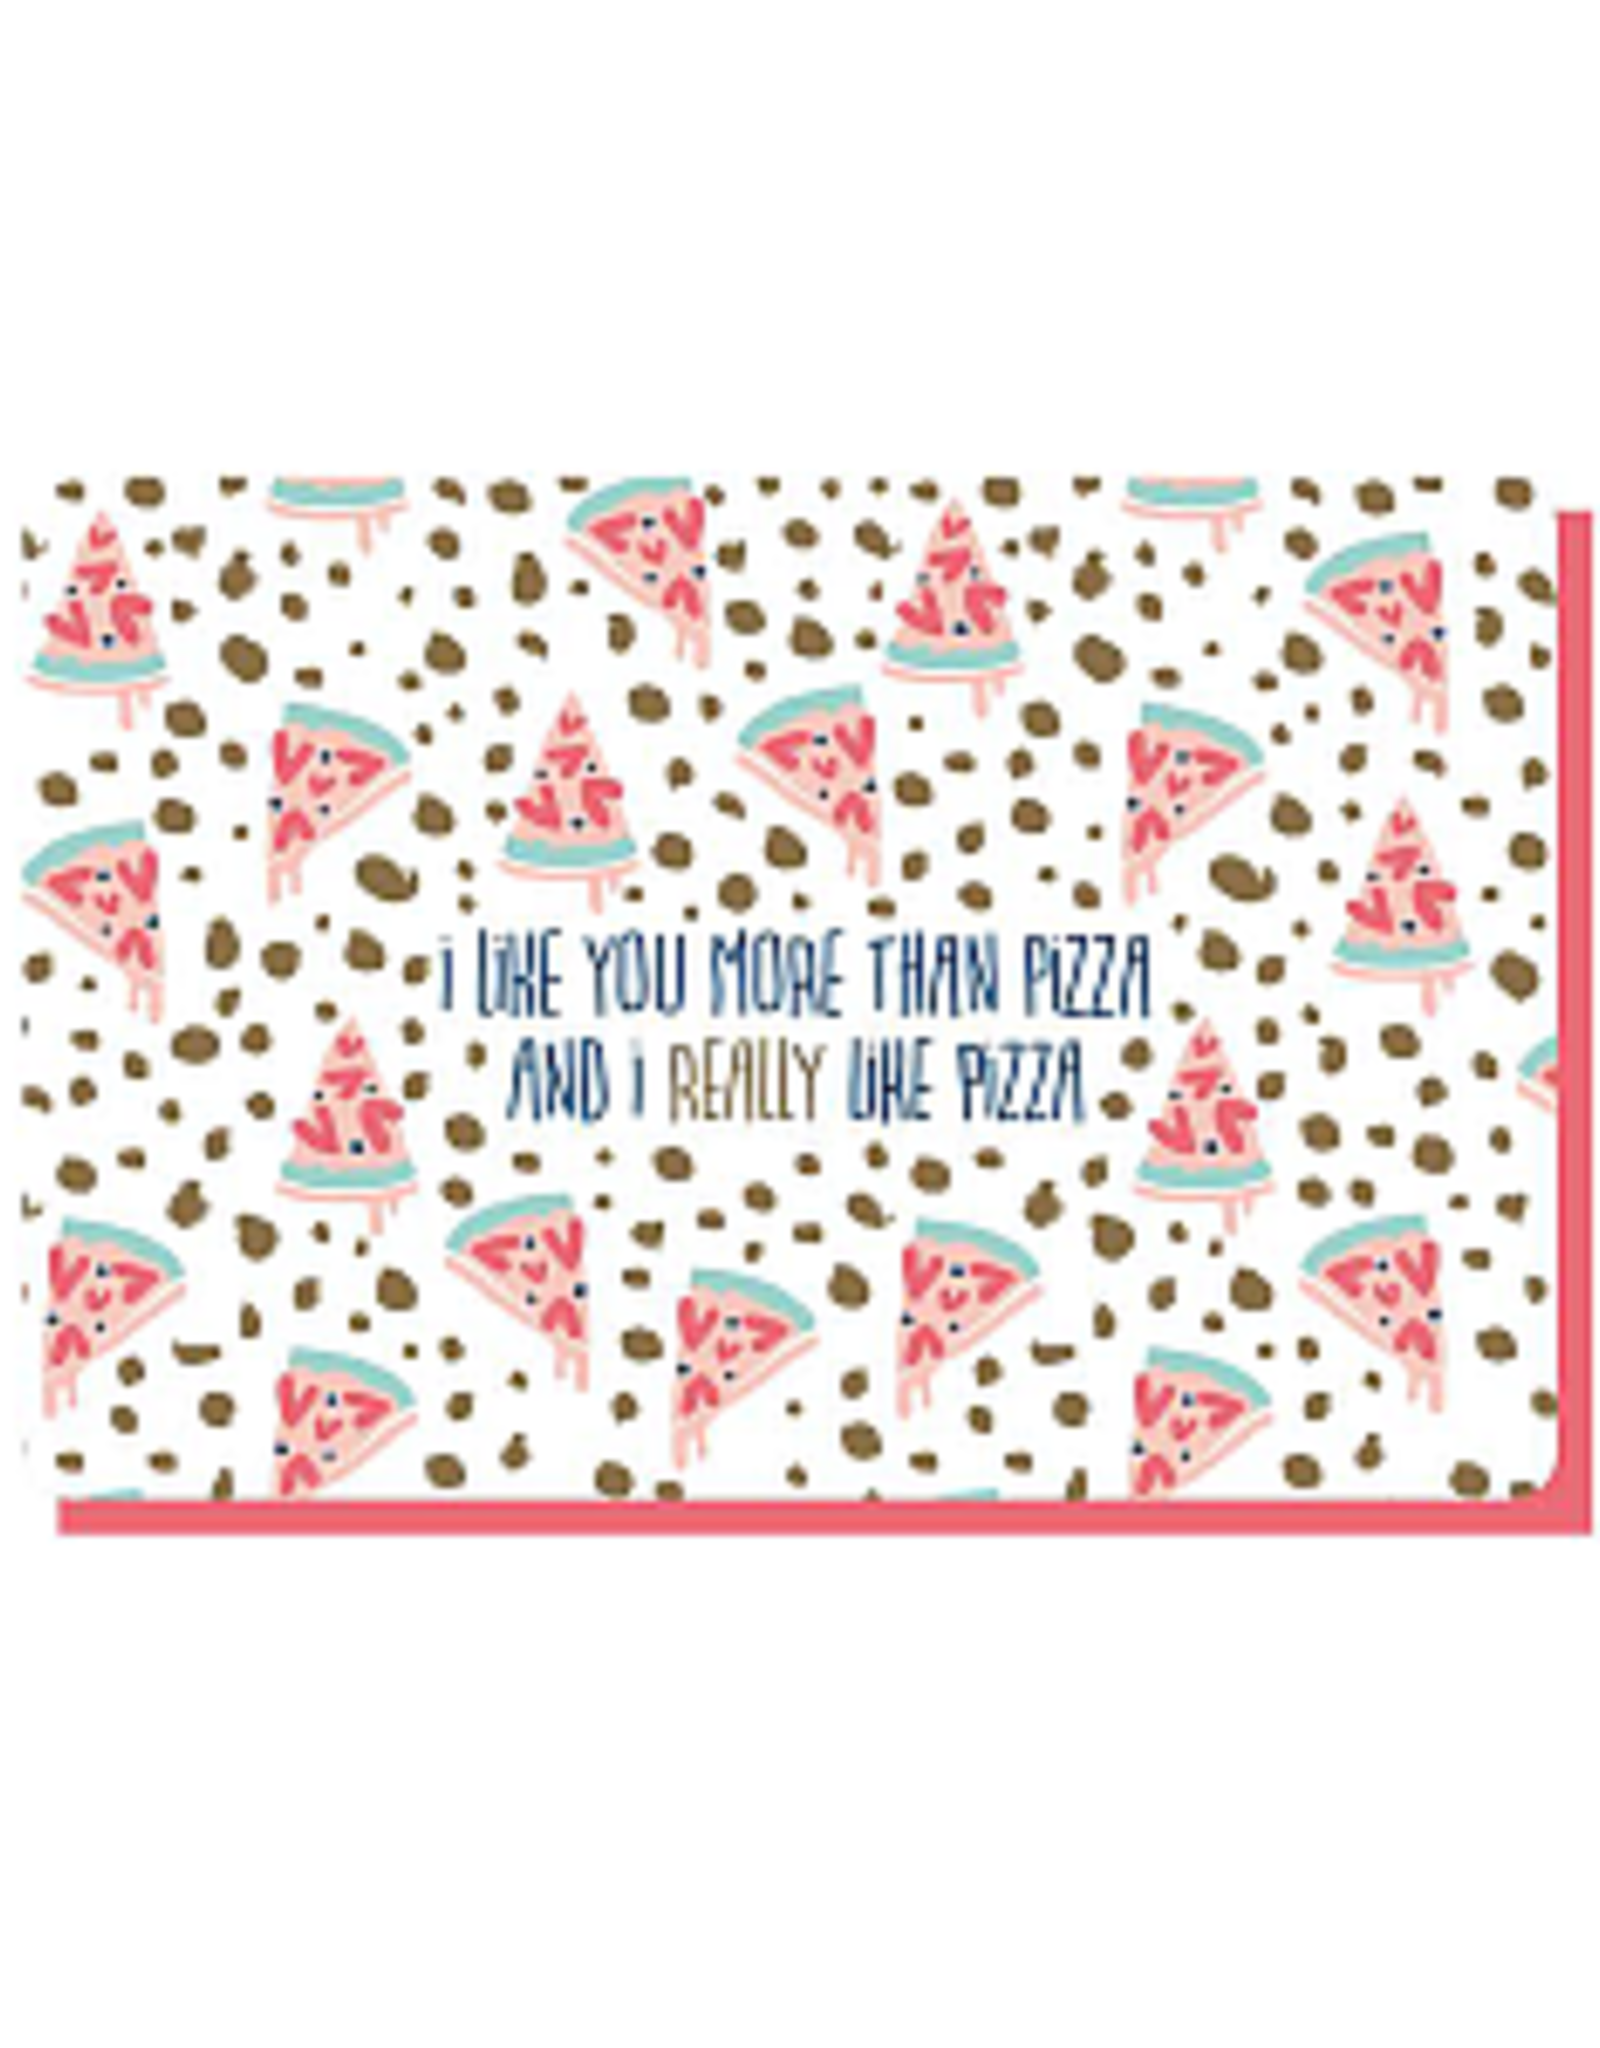 Enfant Terrible Dubbele wenskaart Enfant terrible: I like you more than pizza and i really love pizza